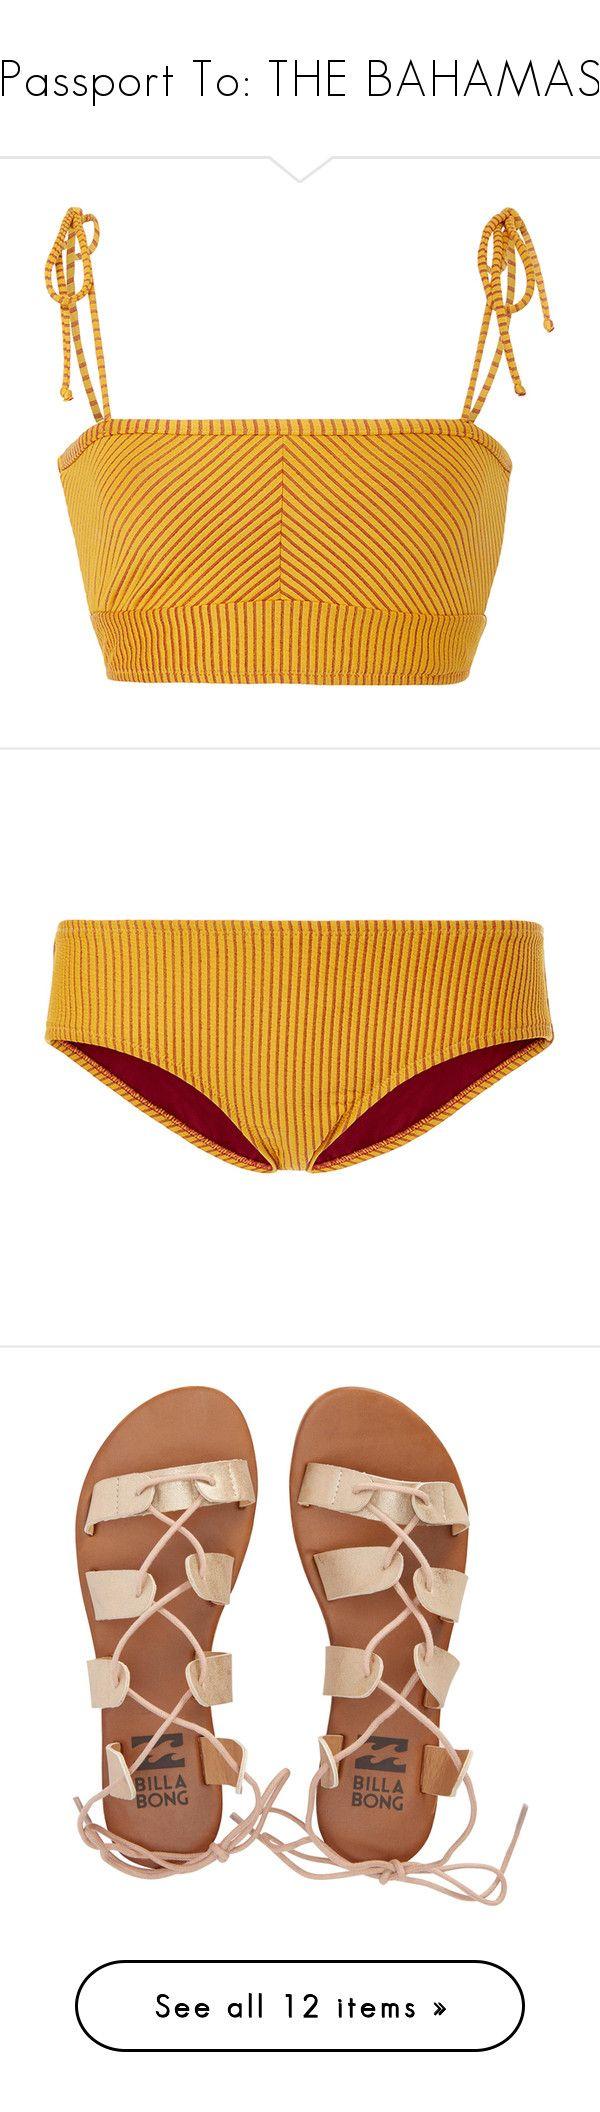 """Passport To: THE BAHAMAS"" by sunsetlvrs ❤ liked on Polyvore featuring swimwear, bikinis, bikini tops, tops, shirts, crop tops, bikini, orange, cut out bikini top and cut-out bikinis"